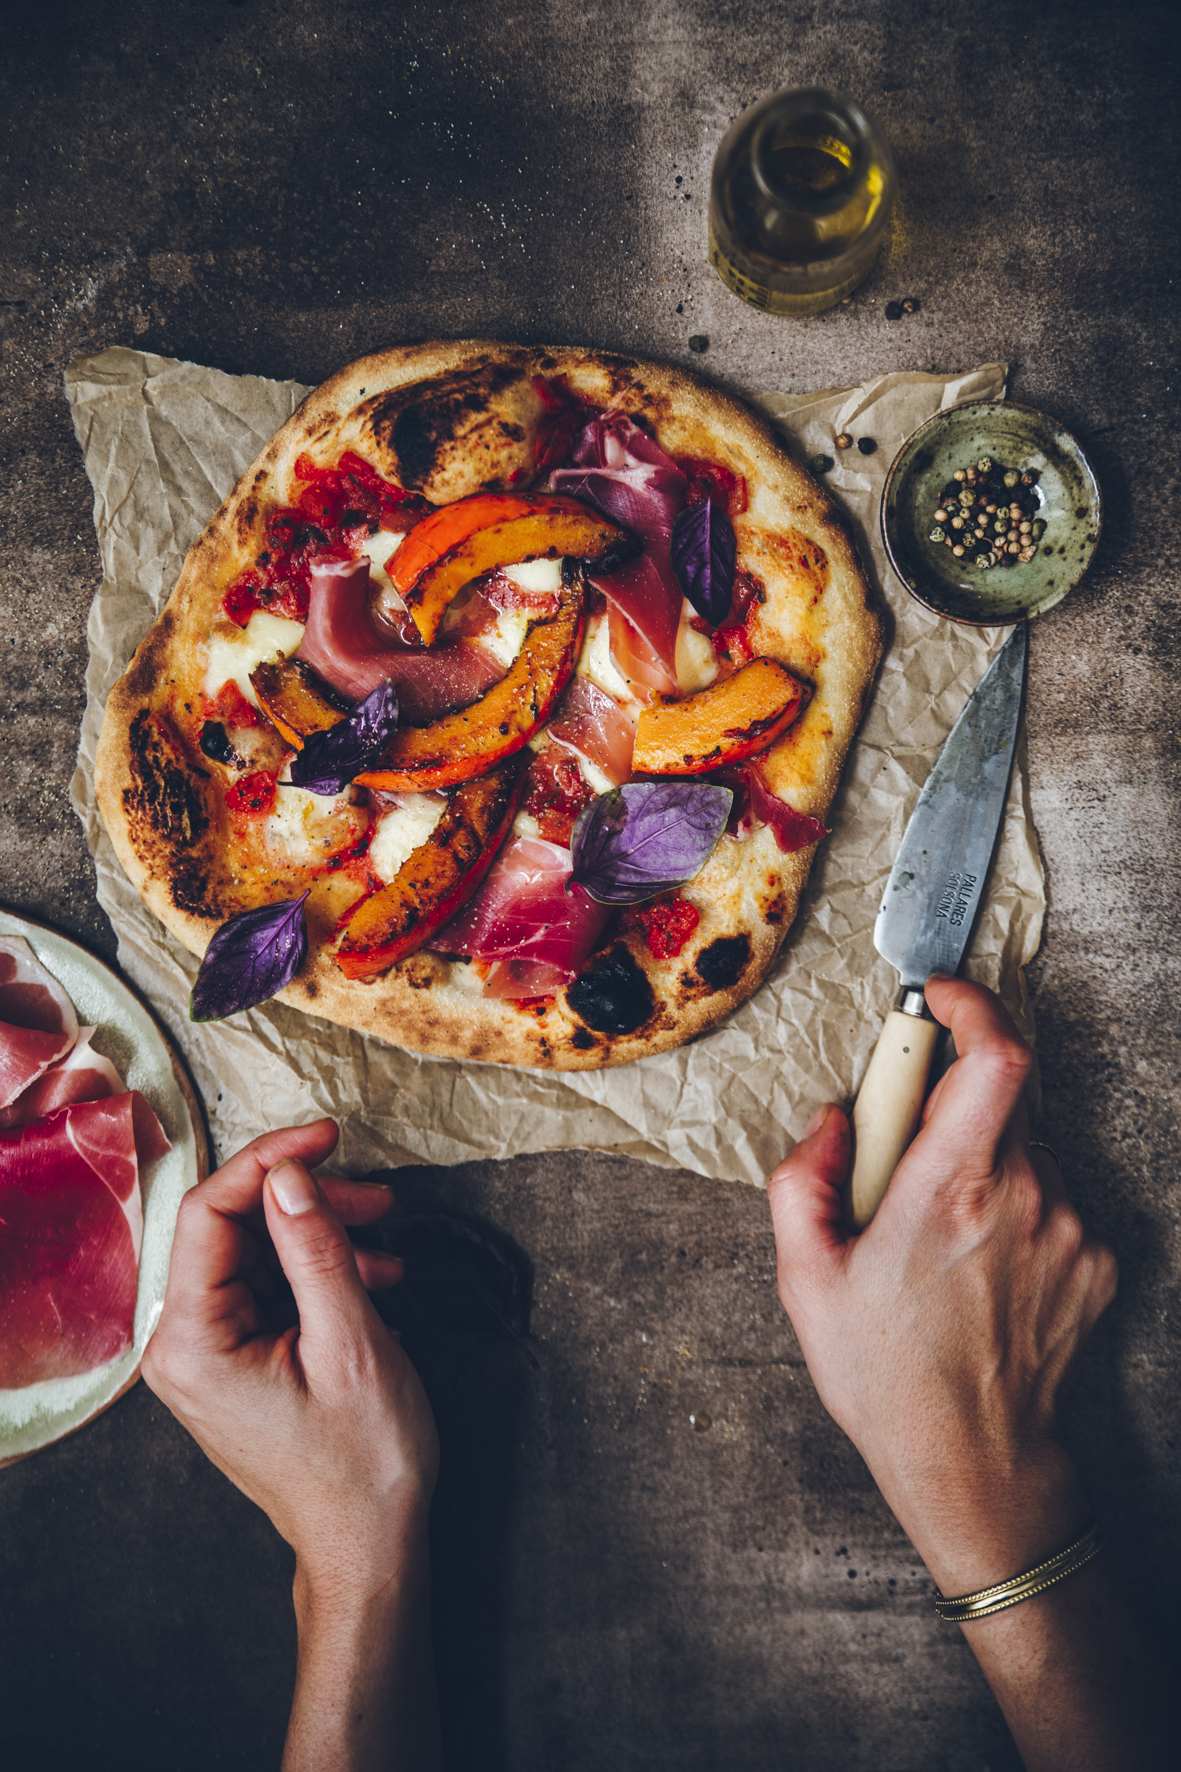 Pizza d'automne au potimarron et au jambon serrano ©Sandrine Saadi